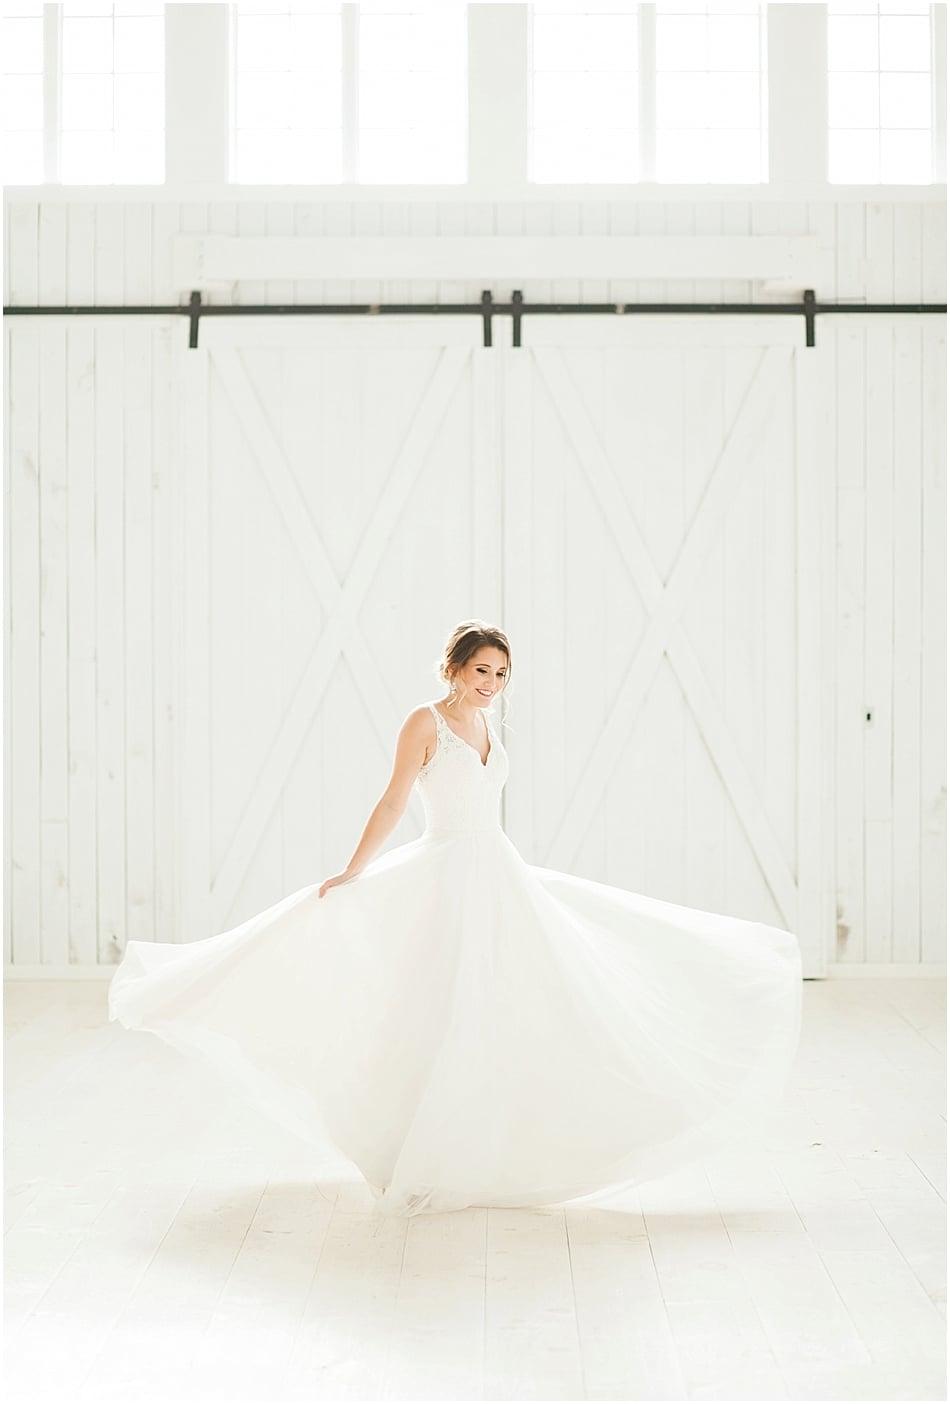 Emilie Anne Photography | White Sparrow Barn | Editorial Shoot | Film_-8.jpg